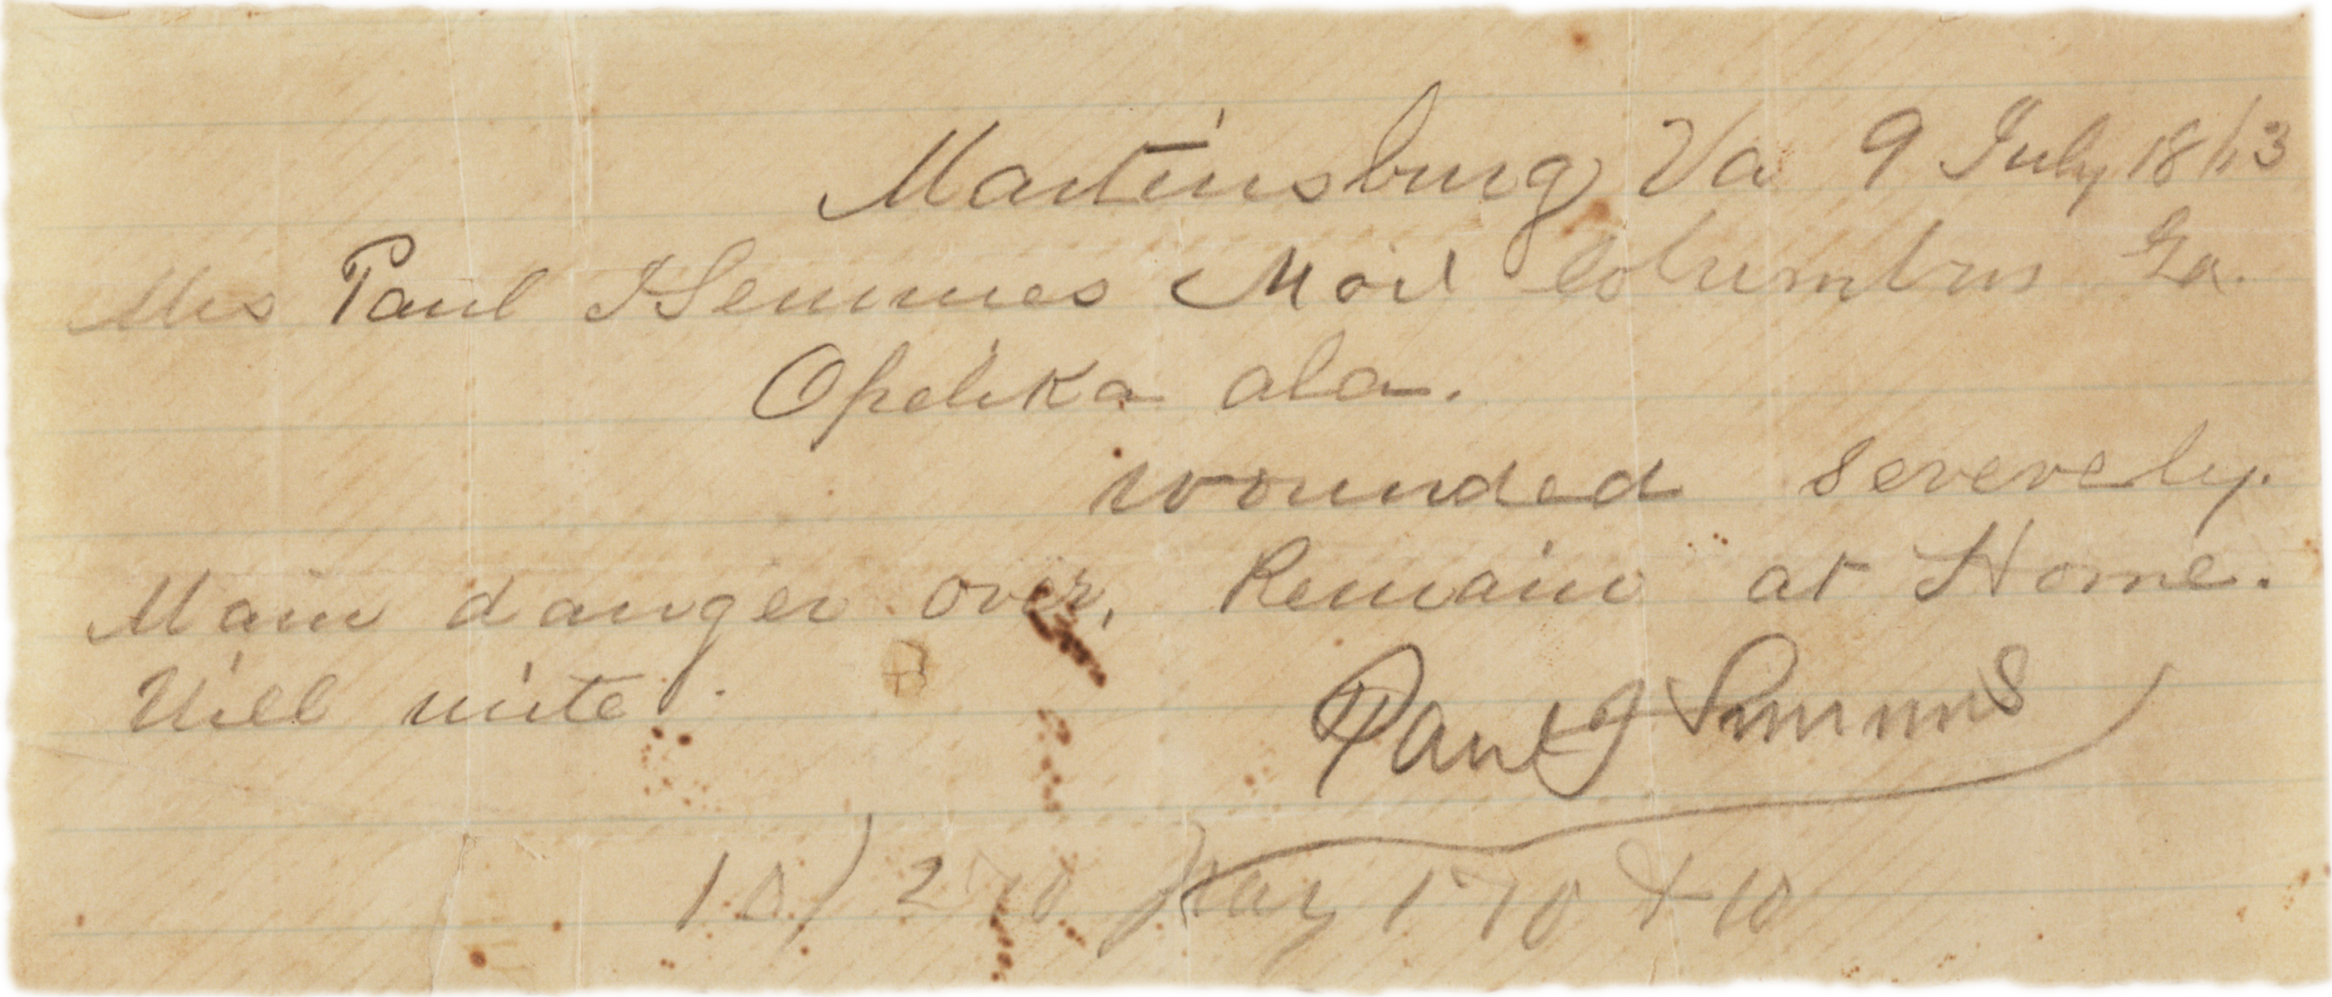 Paul Semmes to Emily Semmes, July 9, 1863. (GLC00458)